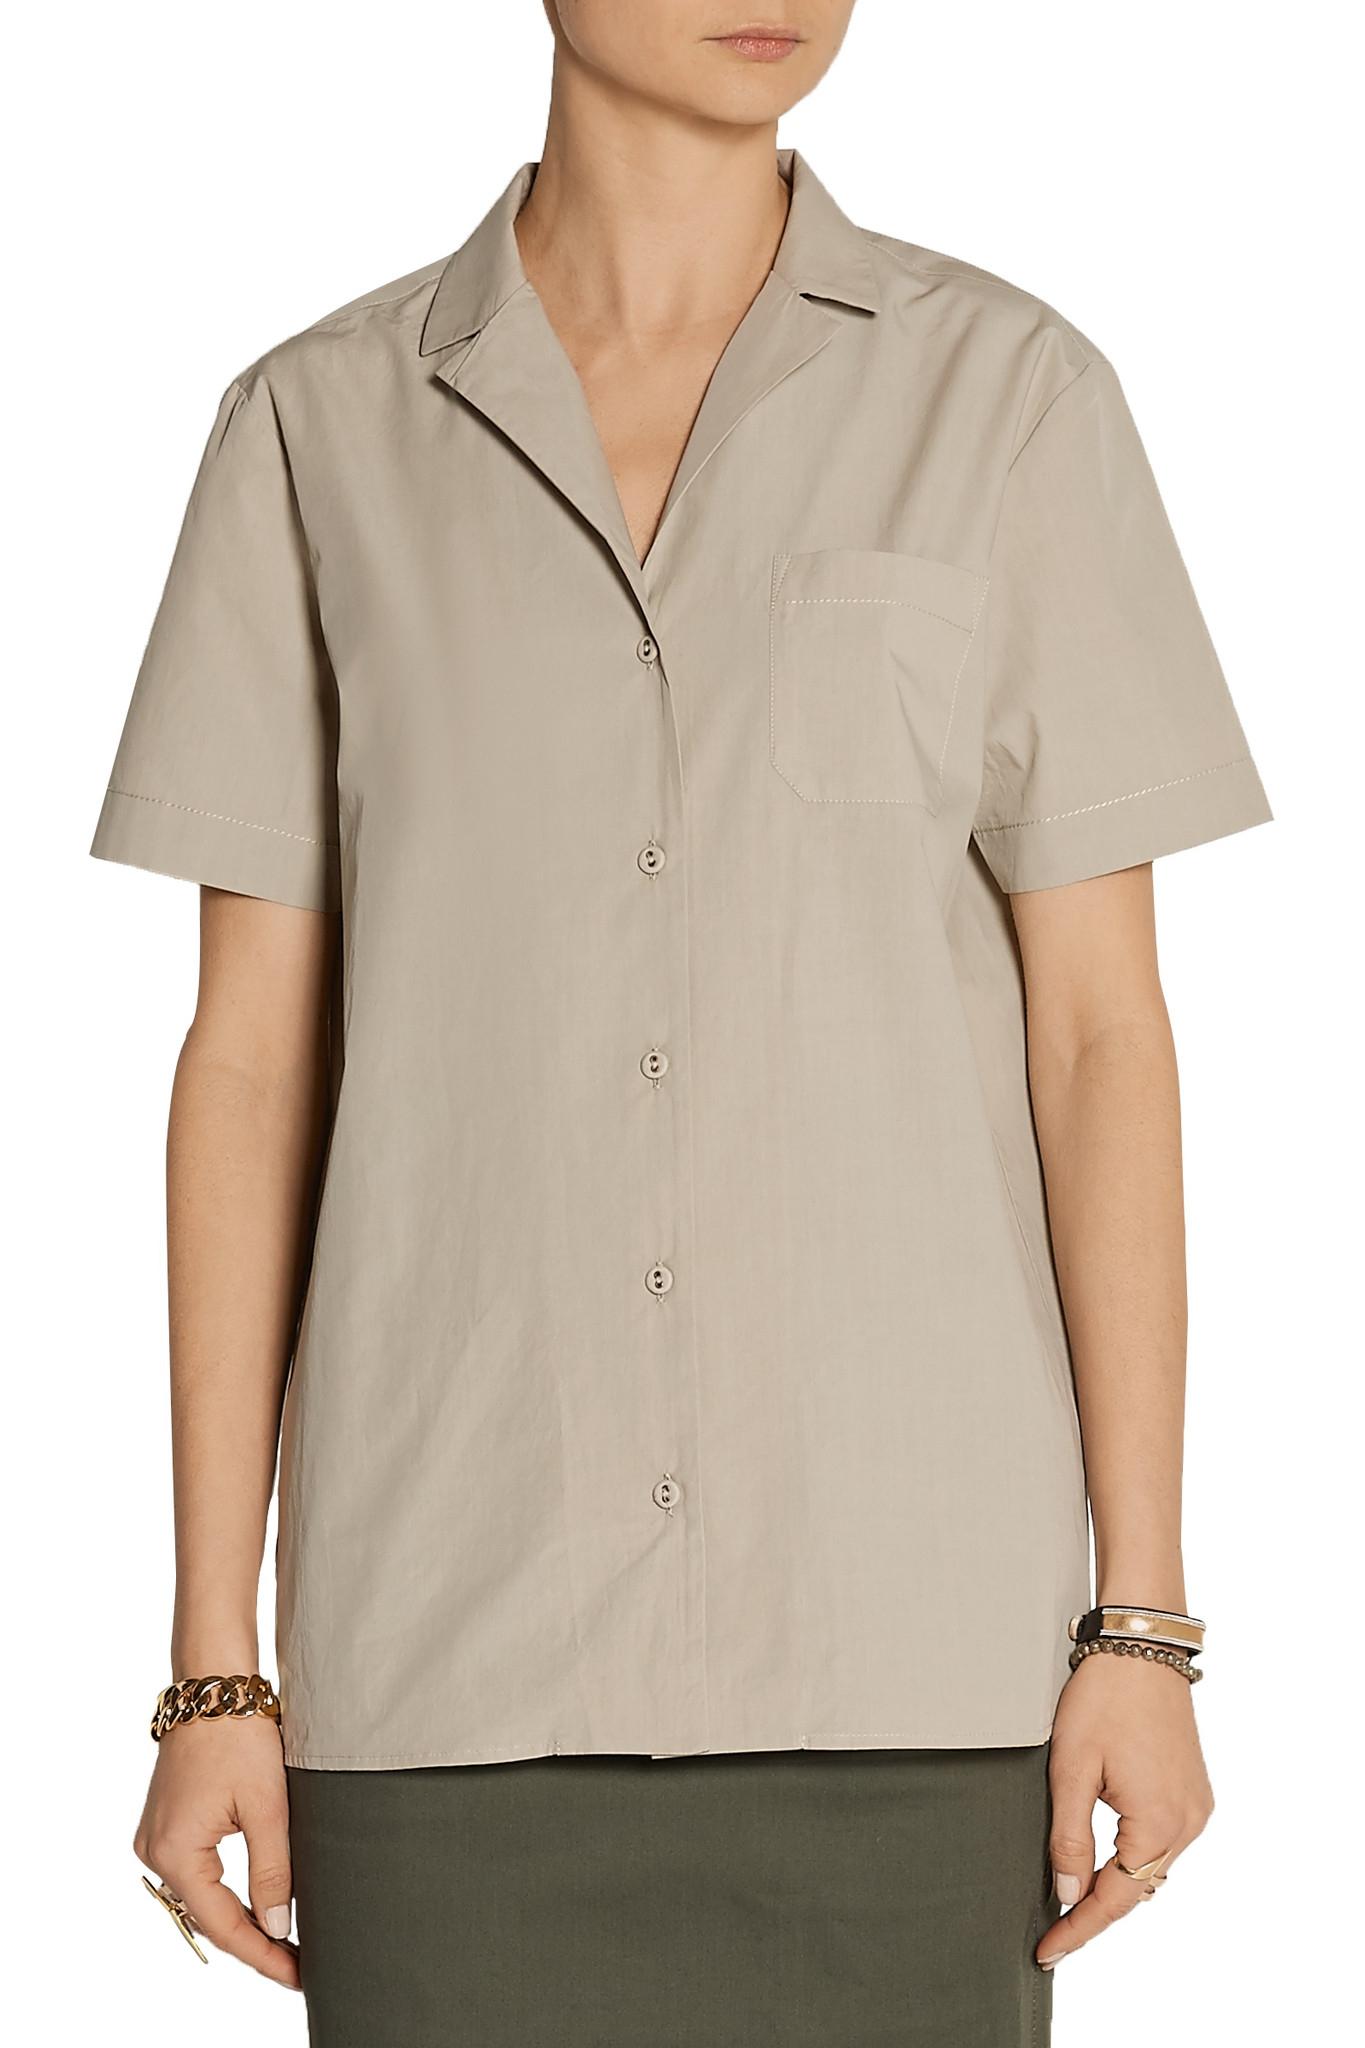 Tomas maier cotton poplin shirt in beige lyst for What is a poplin shirt